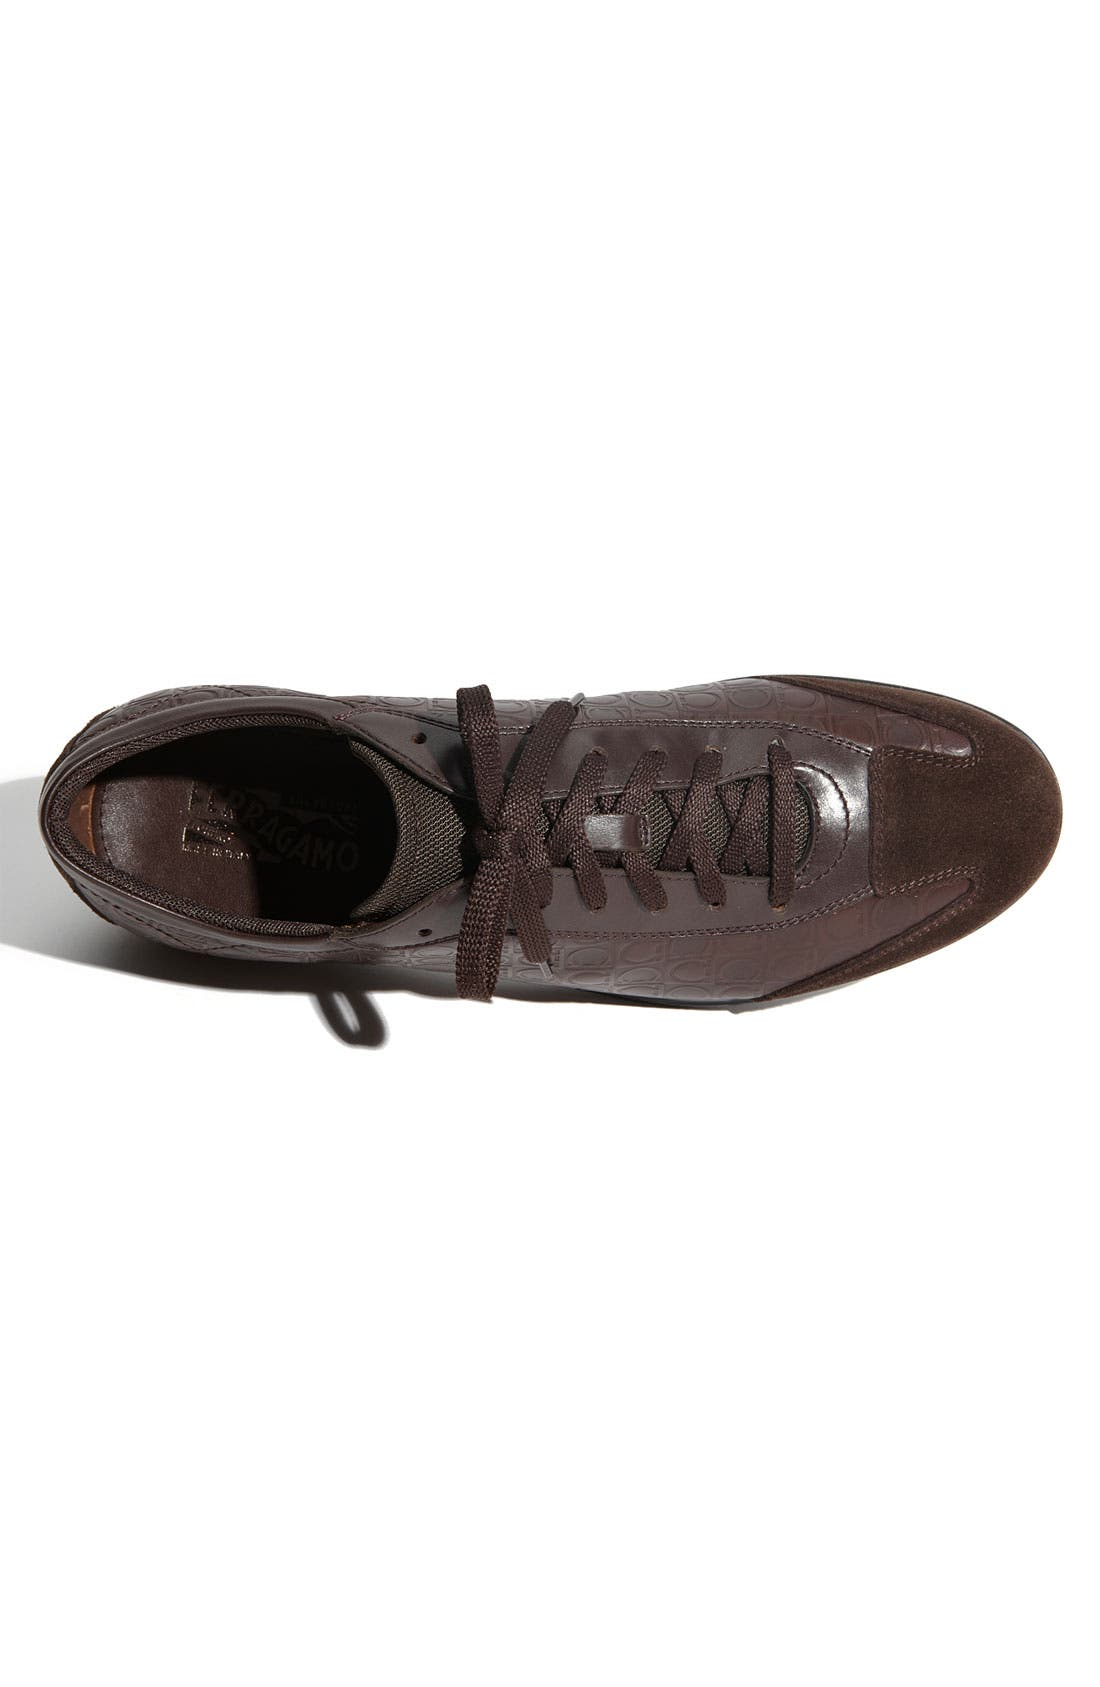 Alternate Image 2  - Salvatore Ferragamo 'Falkland' Sneaker